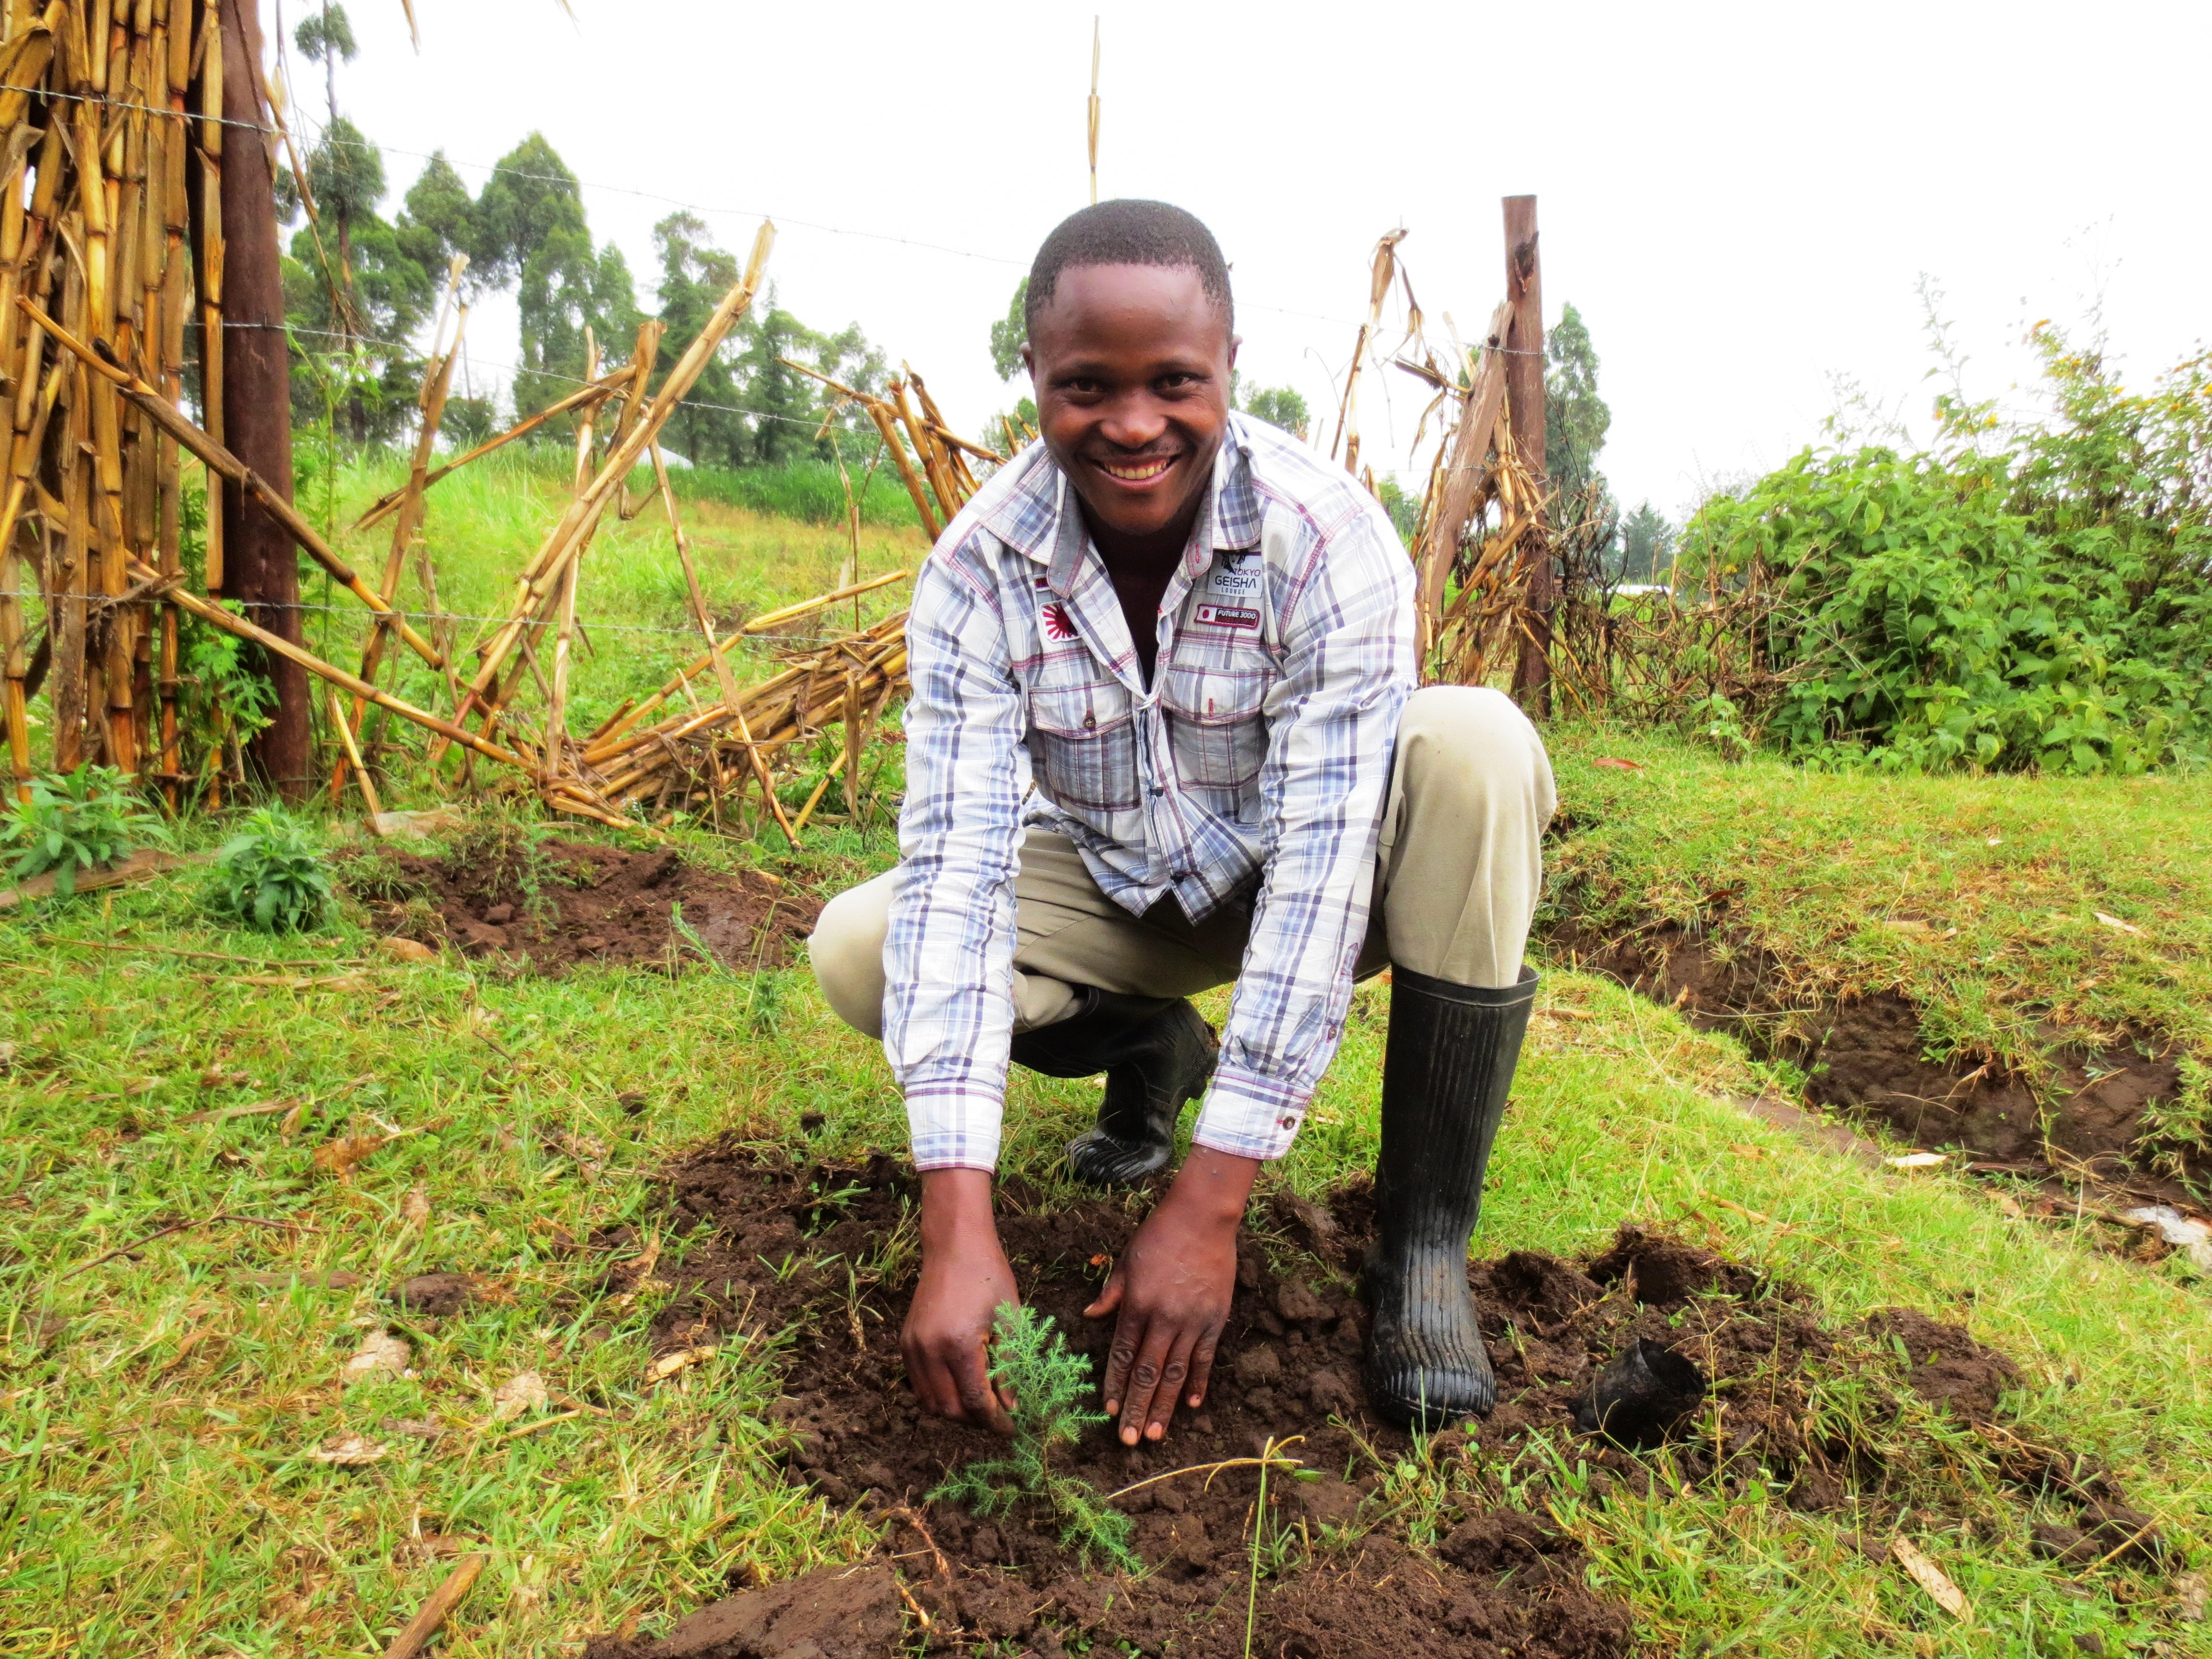 Village Enterprise Business Savings Group member Douglas Omoa plants a tree in Gidea, Kenya.